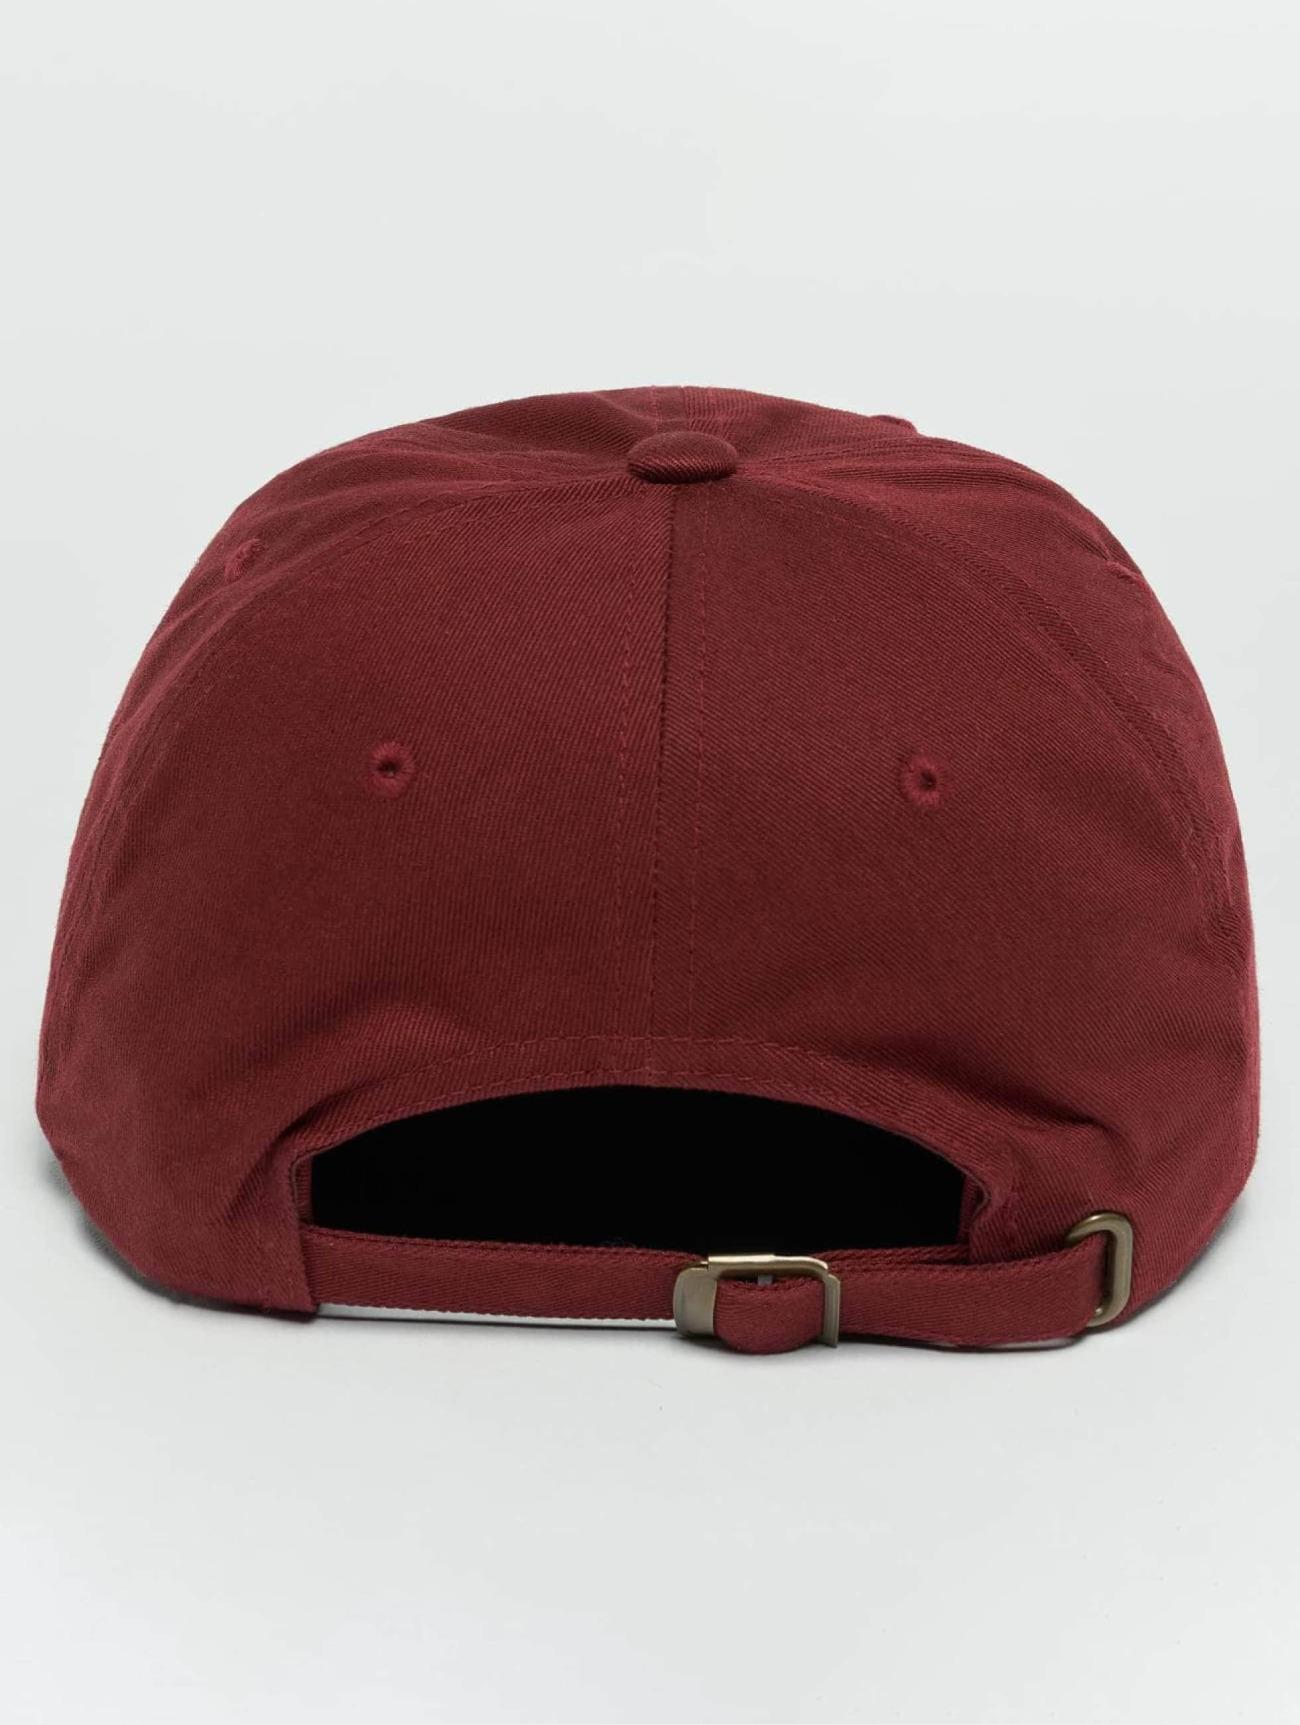 TurnUP  Neigschaut  rouge  Casquette Snapback & Strapback  522285 Homme Casquettes